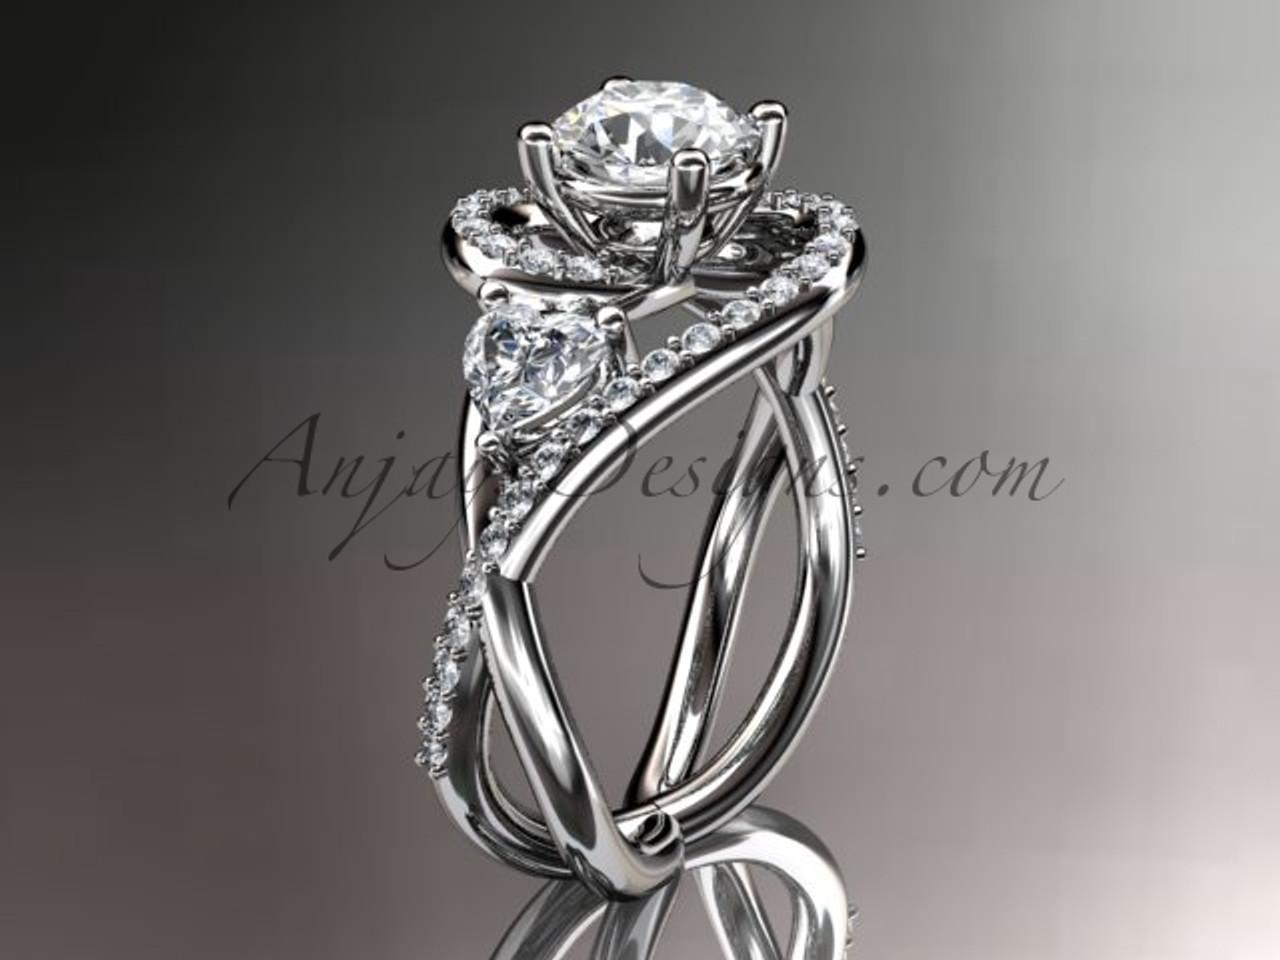 Unusual Wedding Ring Platinum Ring With Moissanite Adlr320